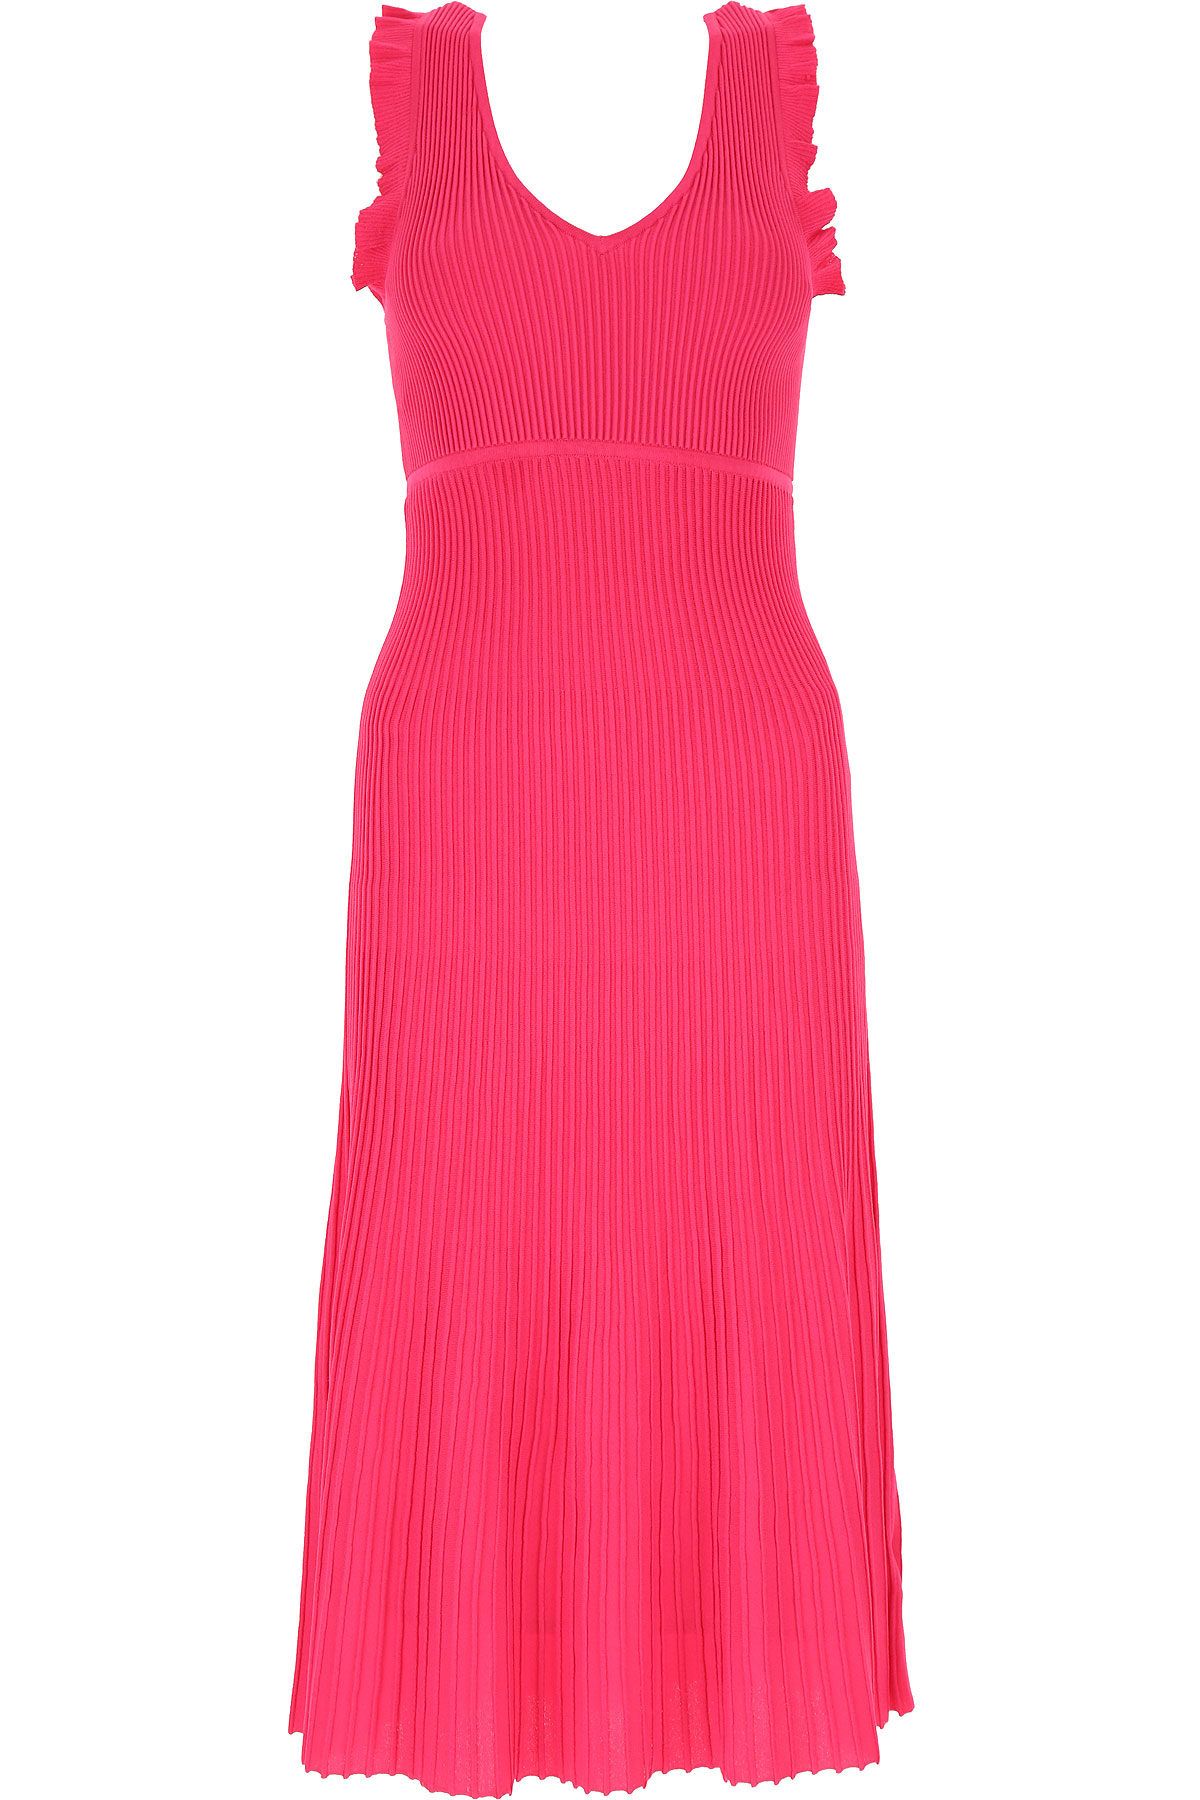 Michael Kors Jurken voor Dames, Avond Cocktail Party In Aanbieding, Roze, Viscose, 2019, 40 M